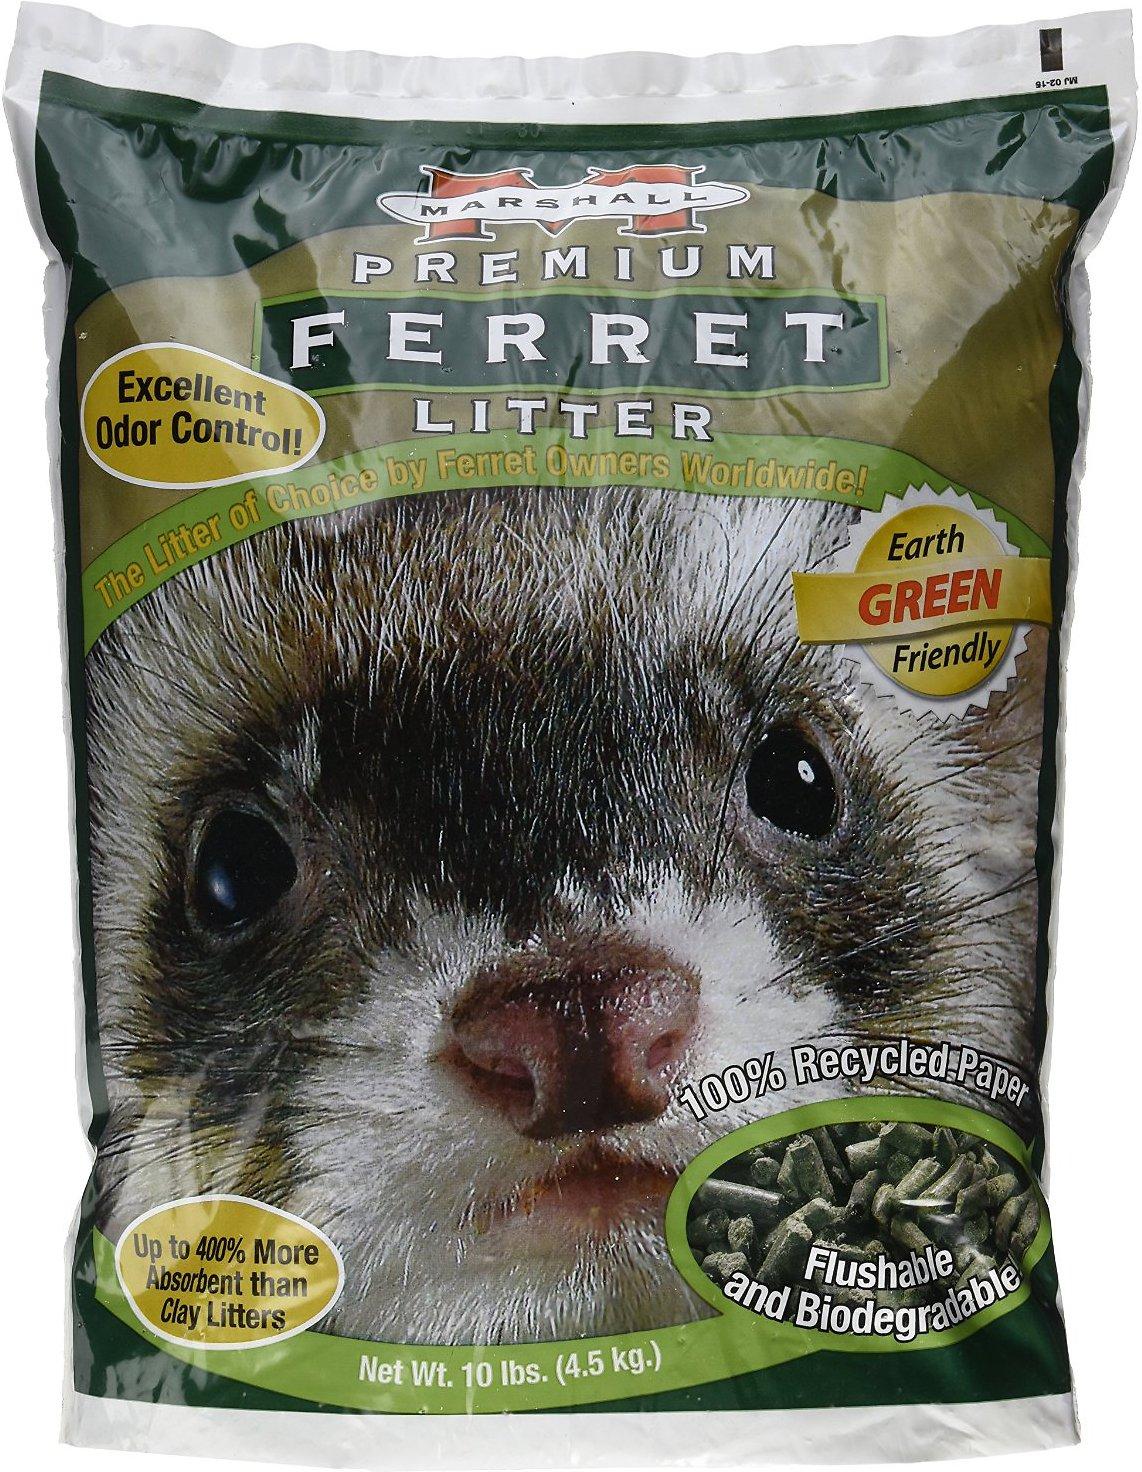 Marshall Premium Odor Control Ferret Litter, 10-lb bag Image